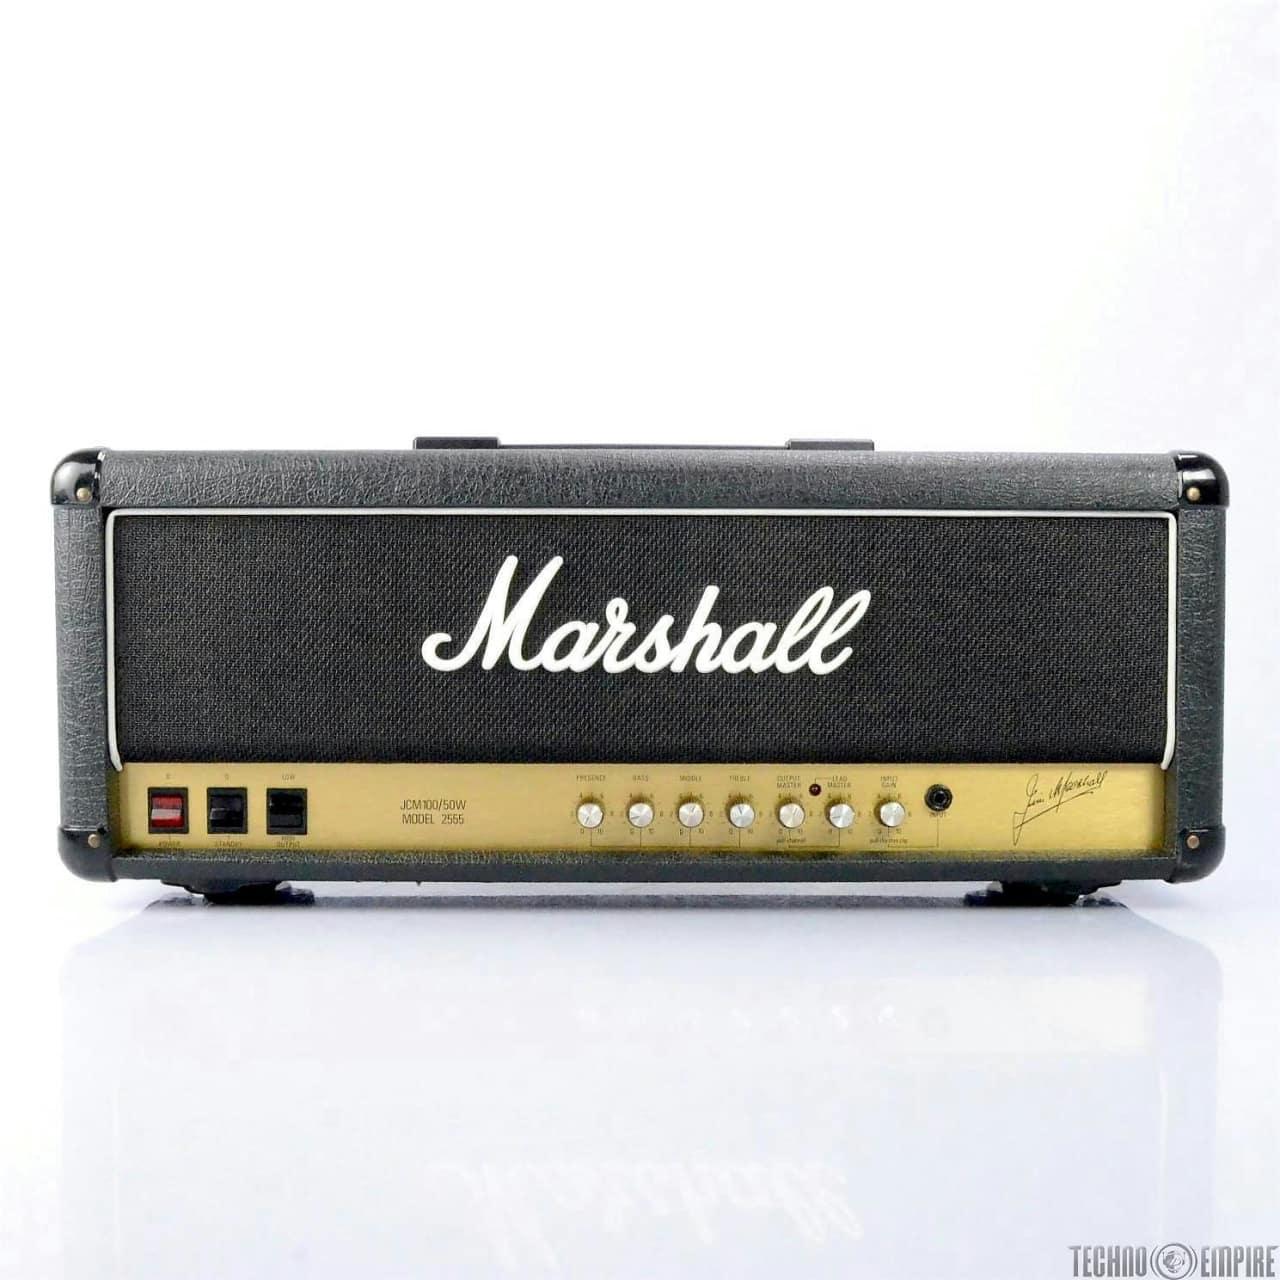 28+ [ Marshall Jcm100 50w 2555 Tube ] Marshall Jcm100 50w 2555 Tube Guitar Head Owned By,Used ...